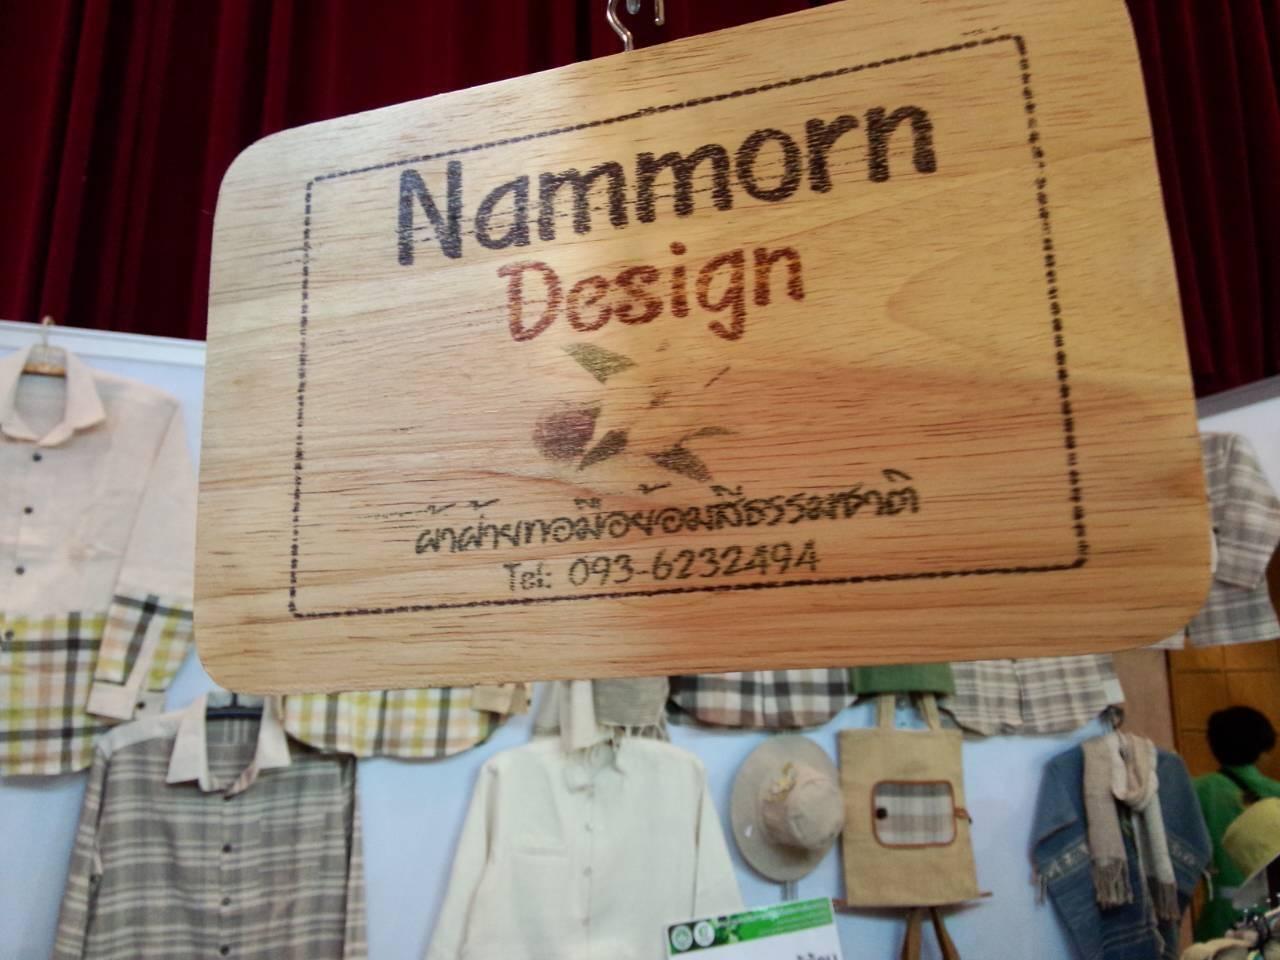 Nammorn Exhibition SCB Otop3 (4)